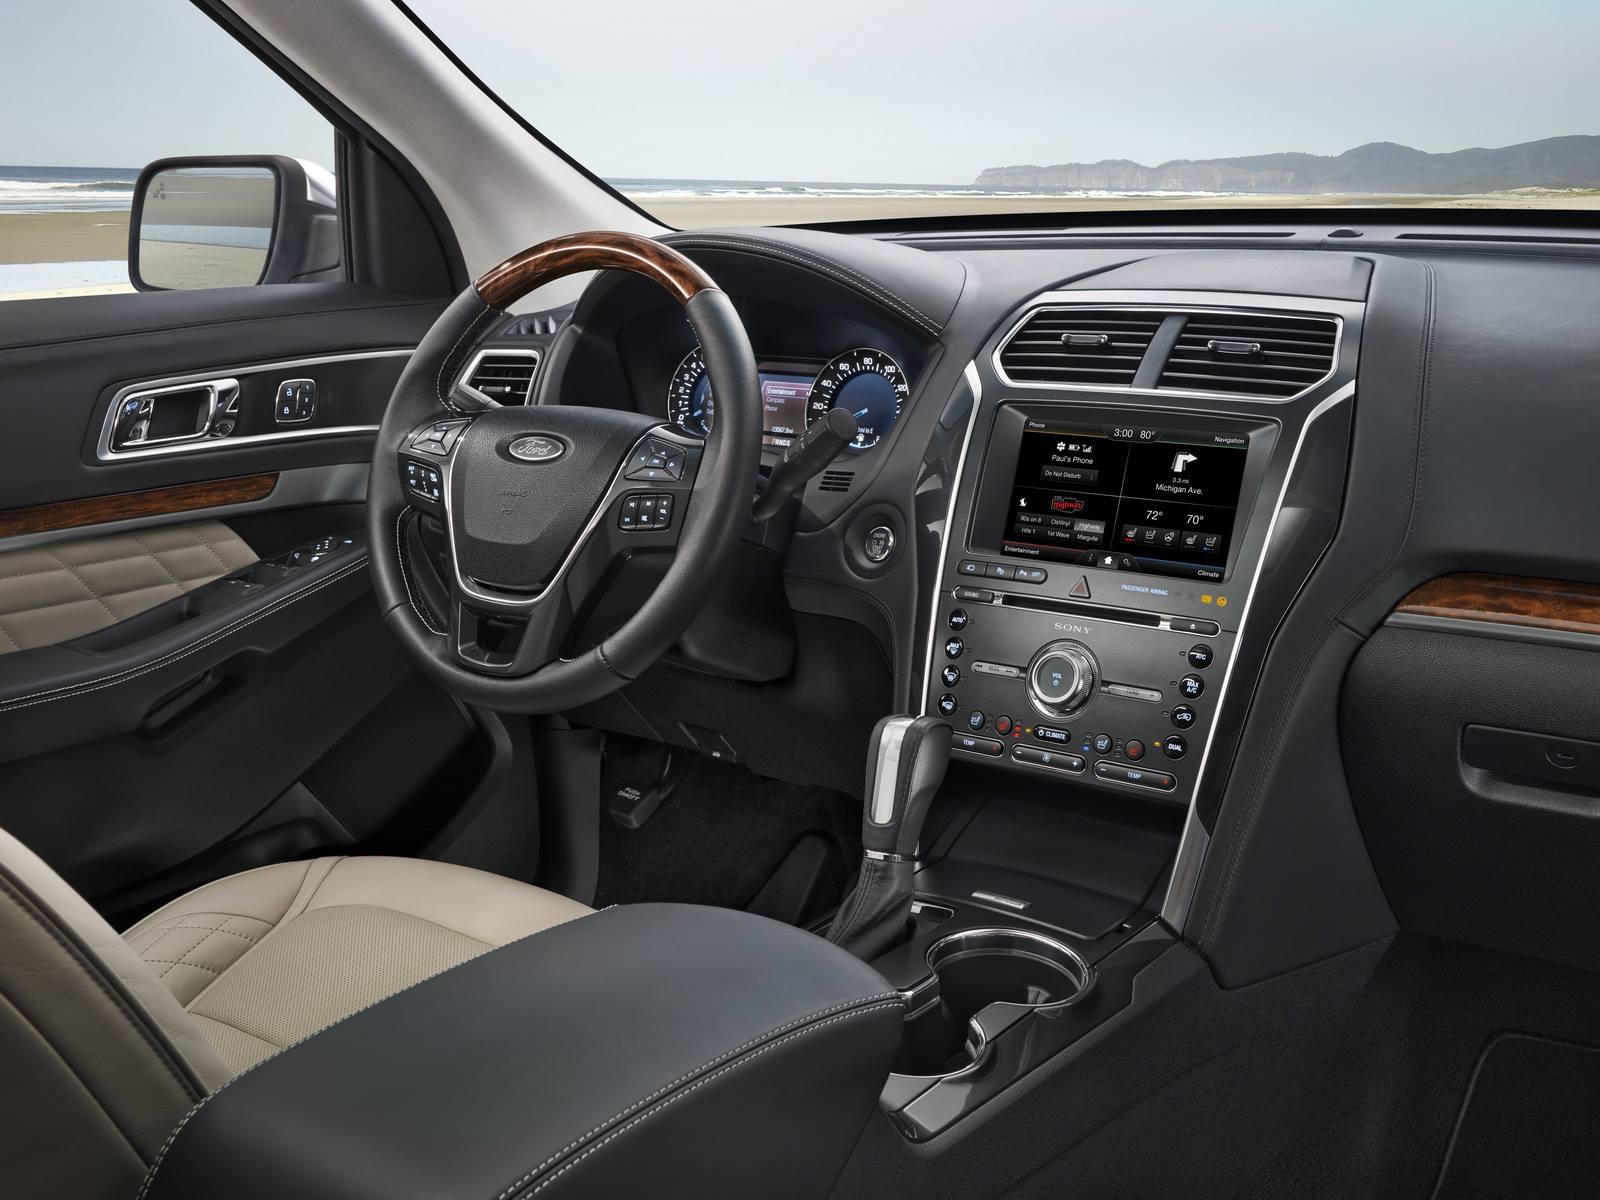 фото нового форд эксплорер 2016